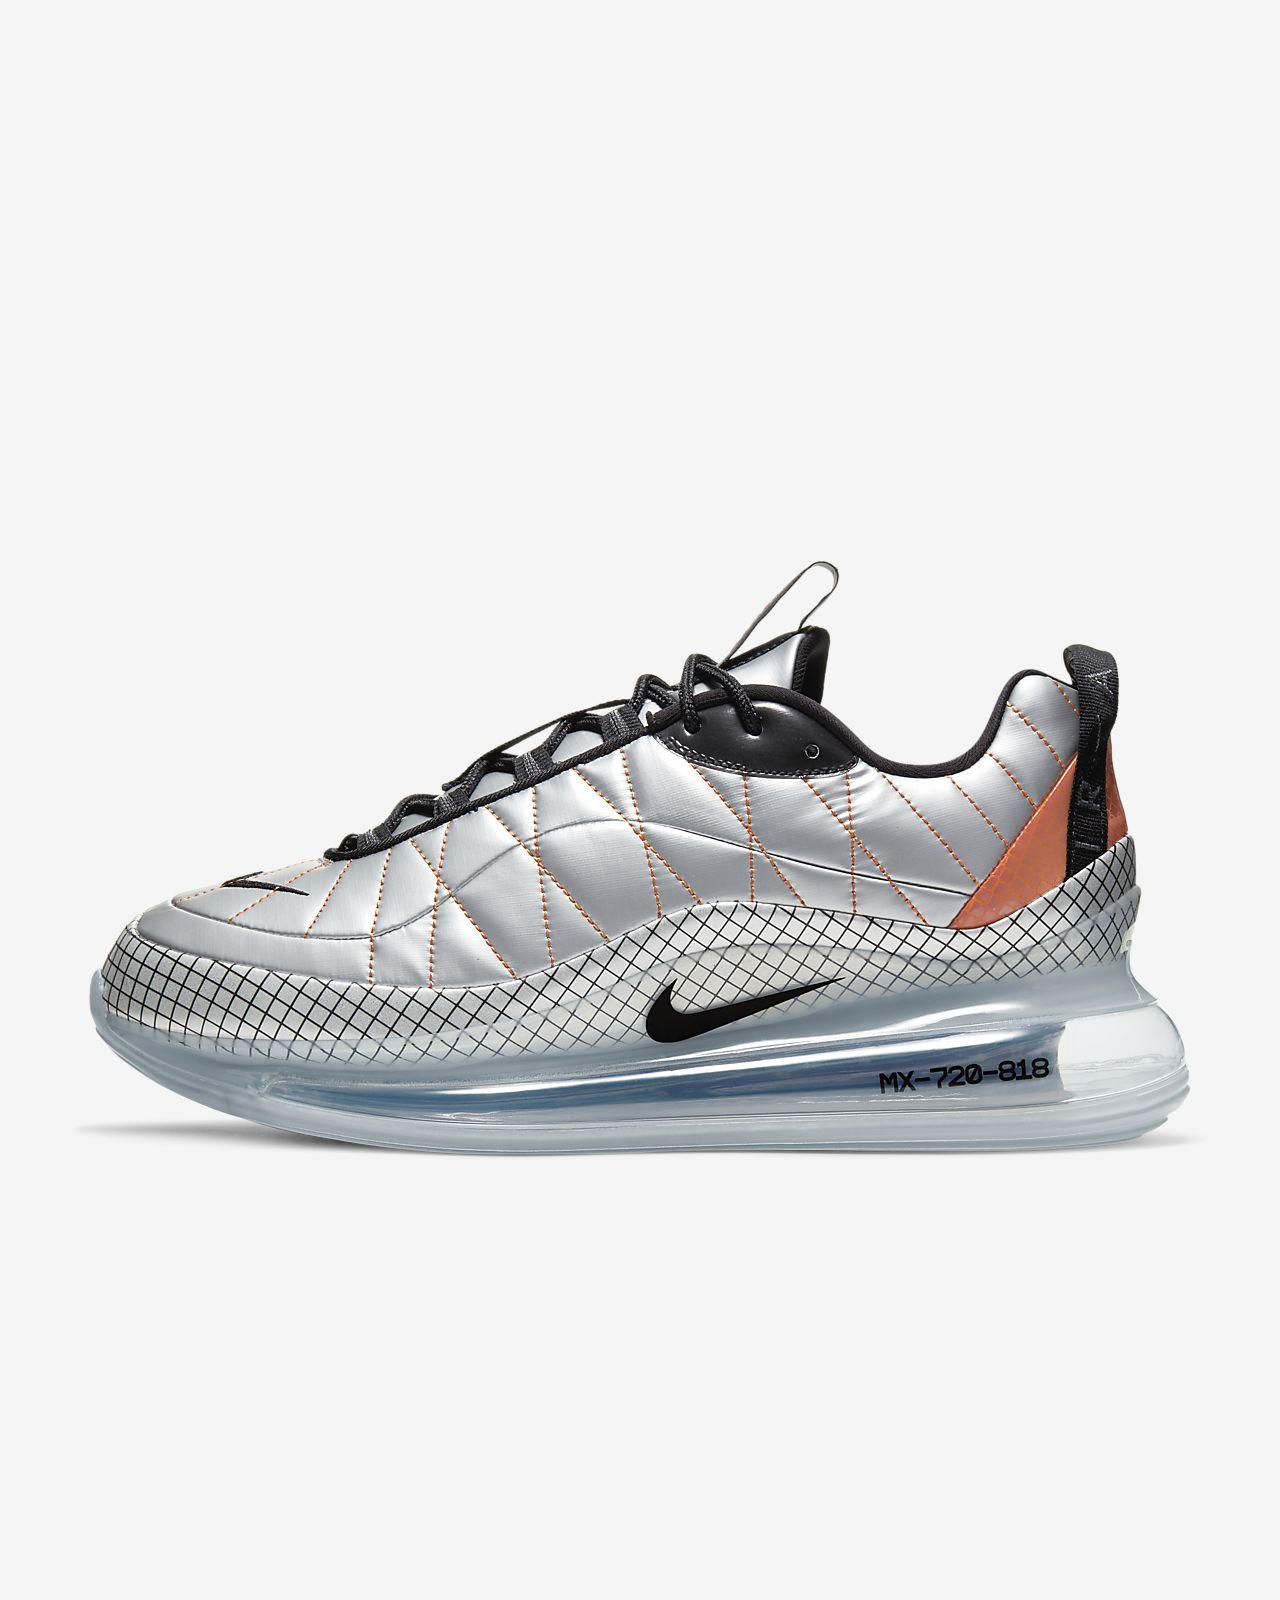 Nike MX-720-818 férficipő